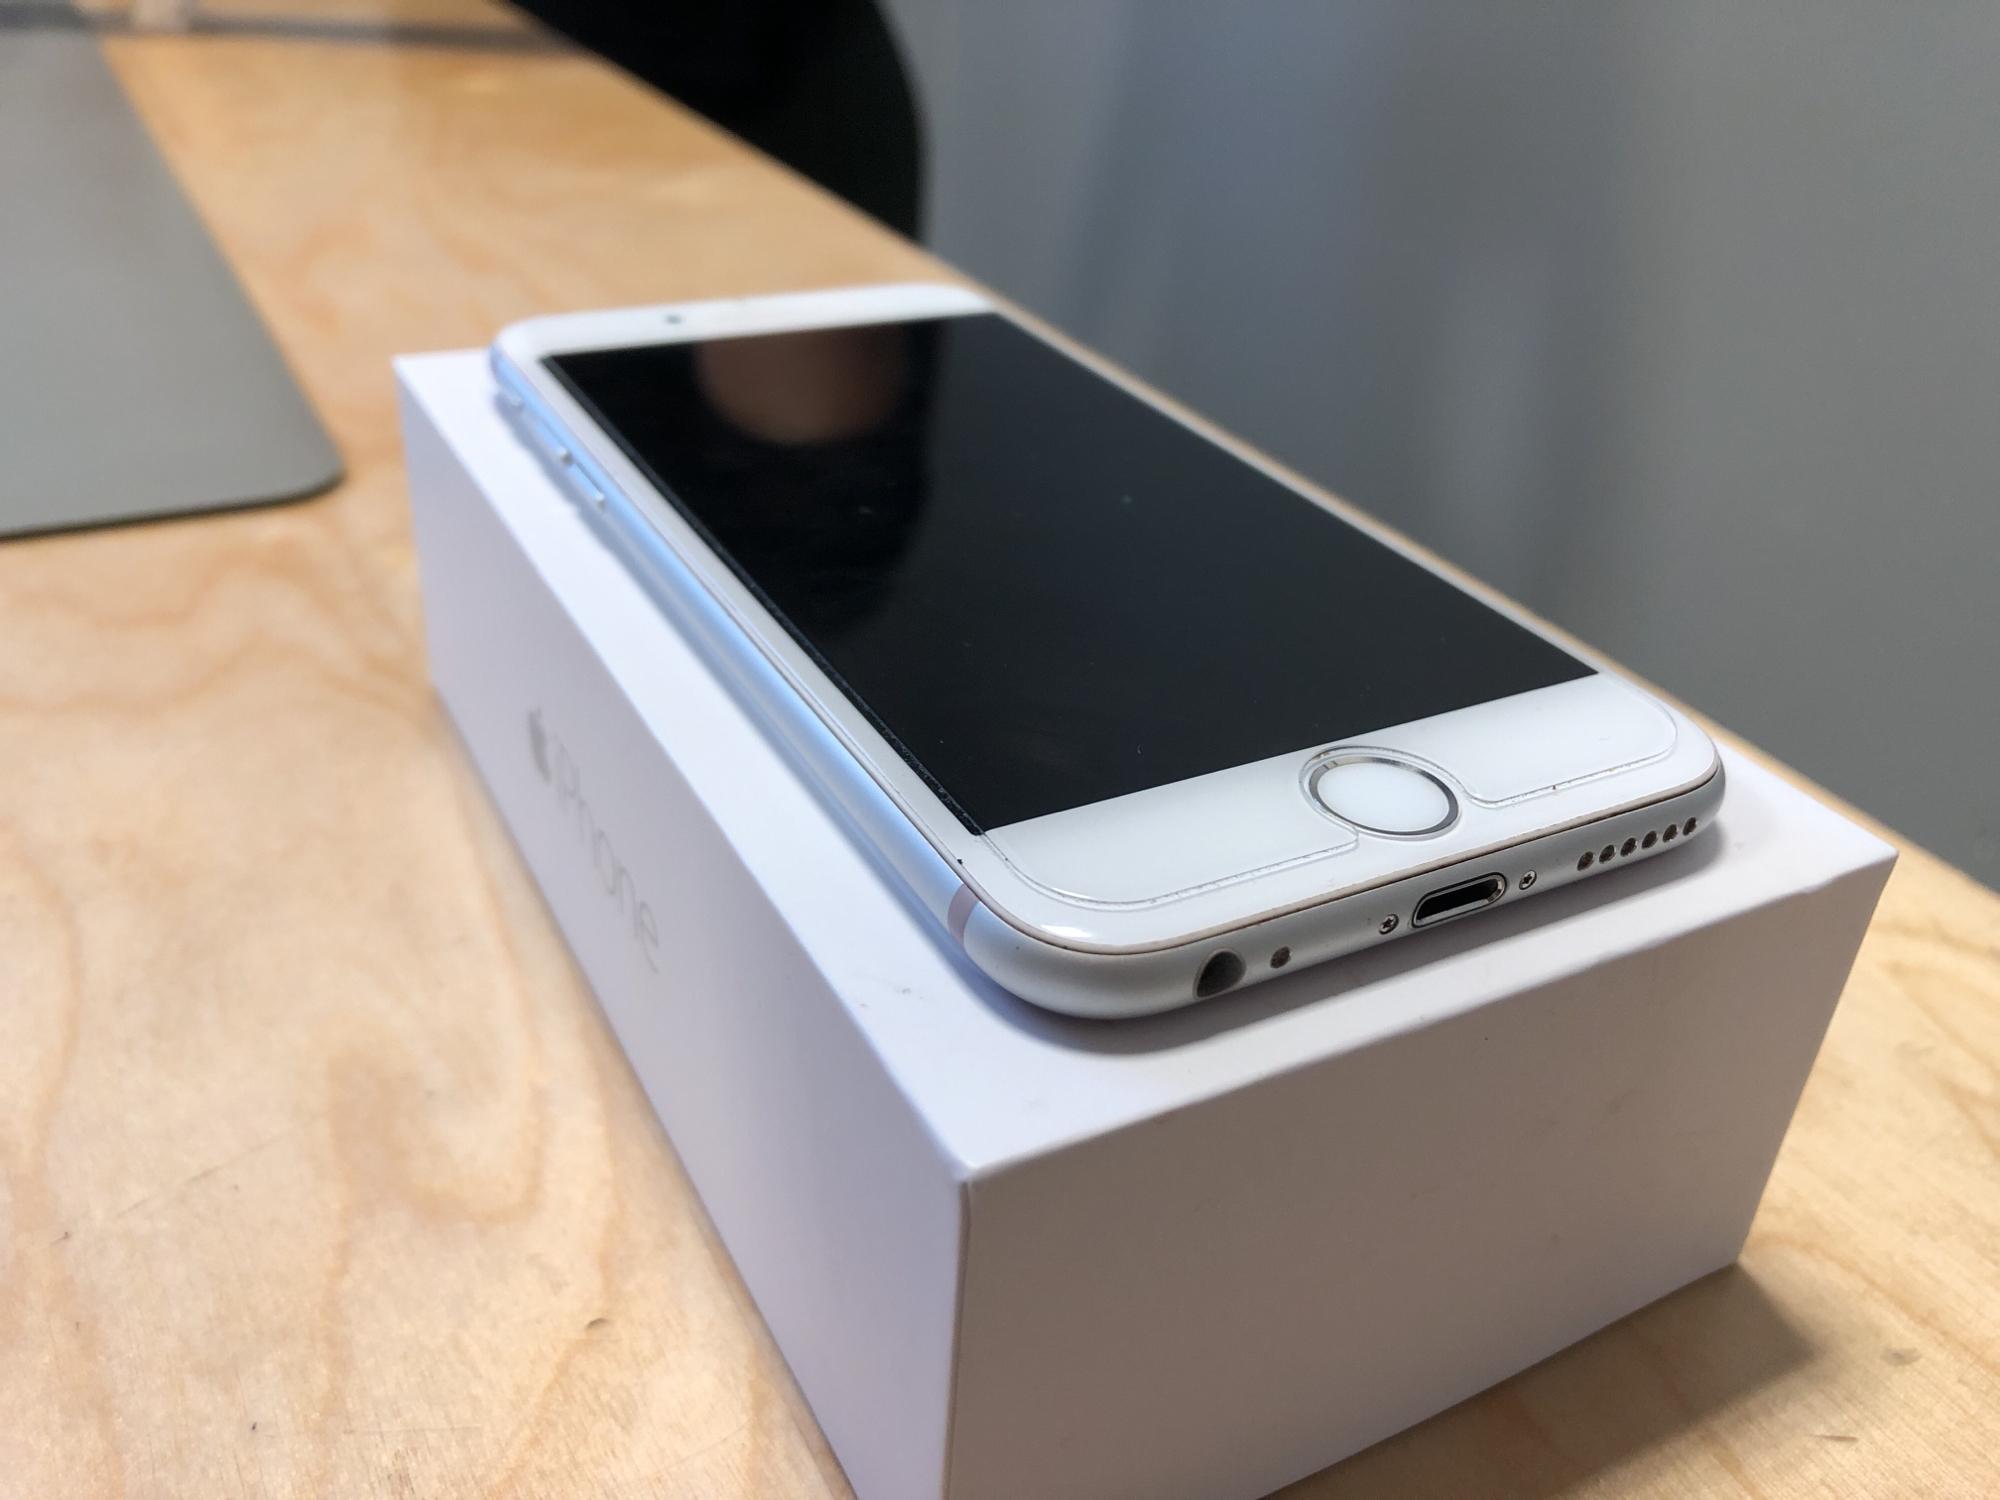 iPhone 6, 16 GB, Silver, imagen 4